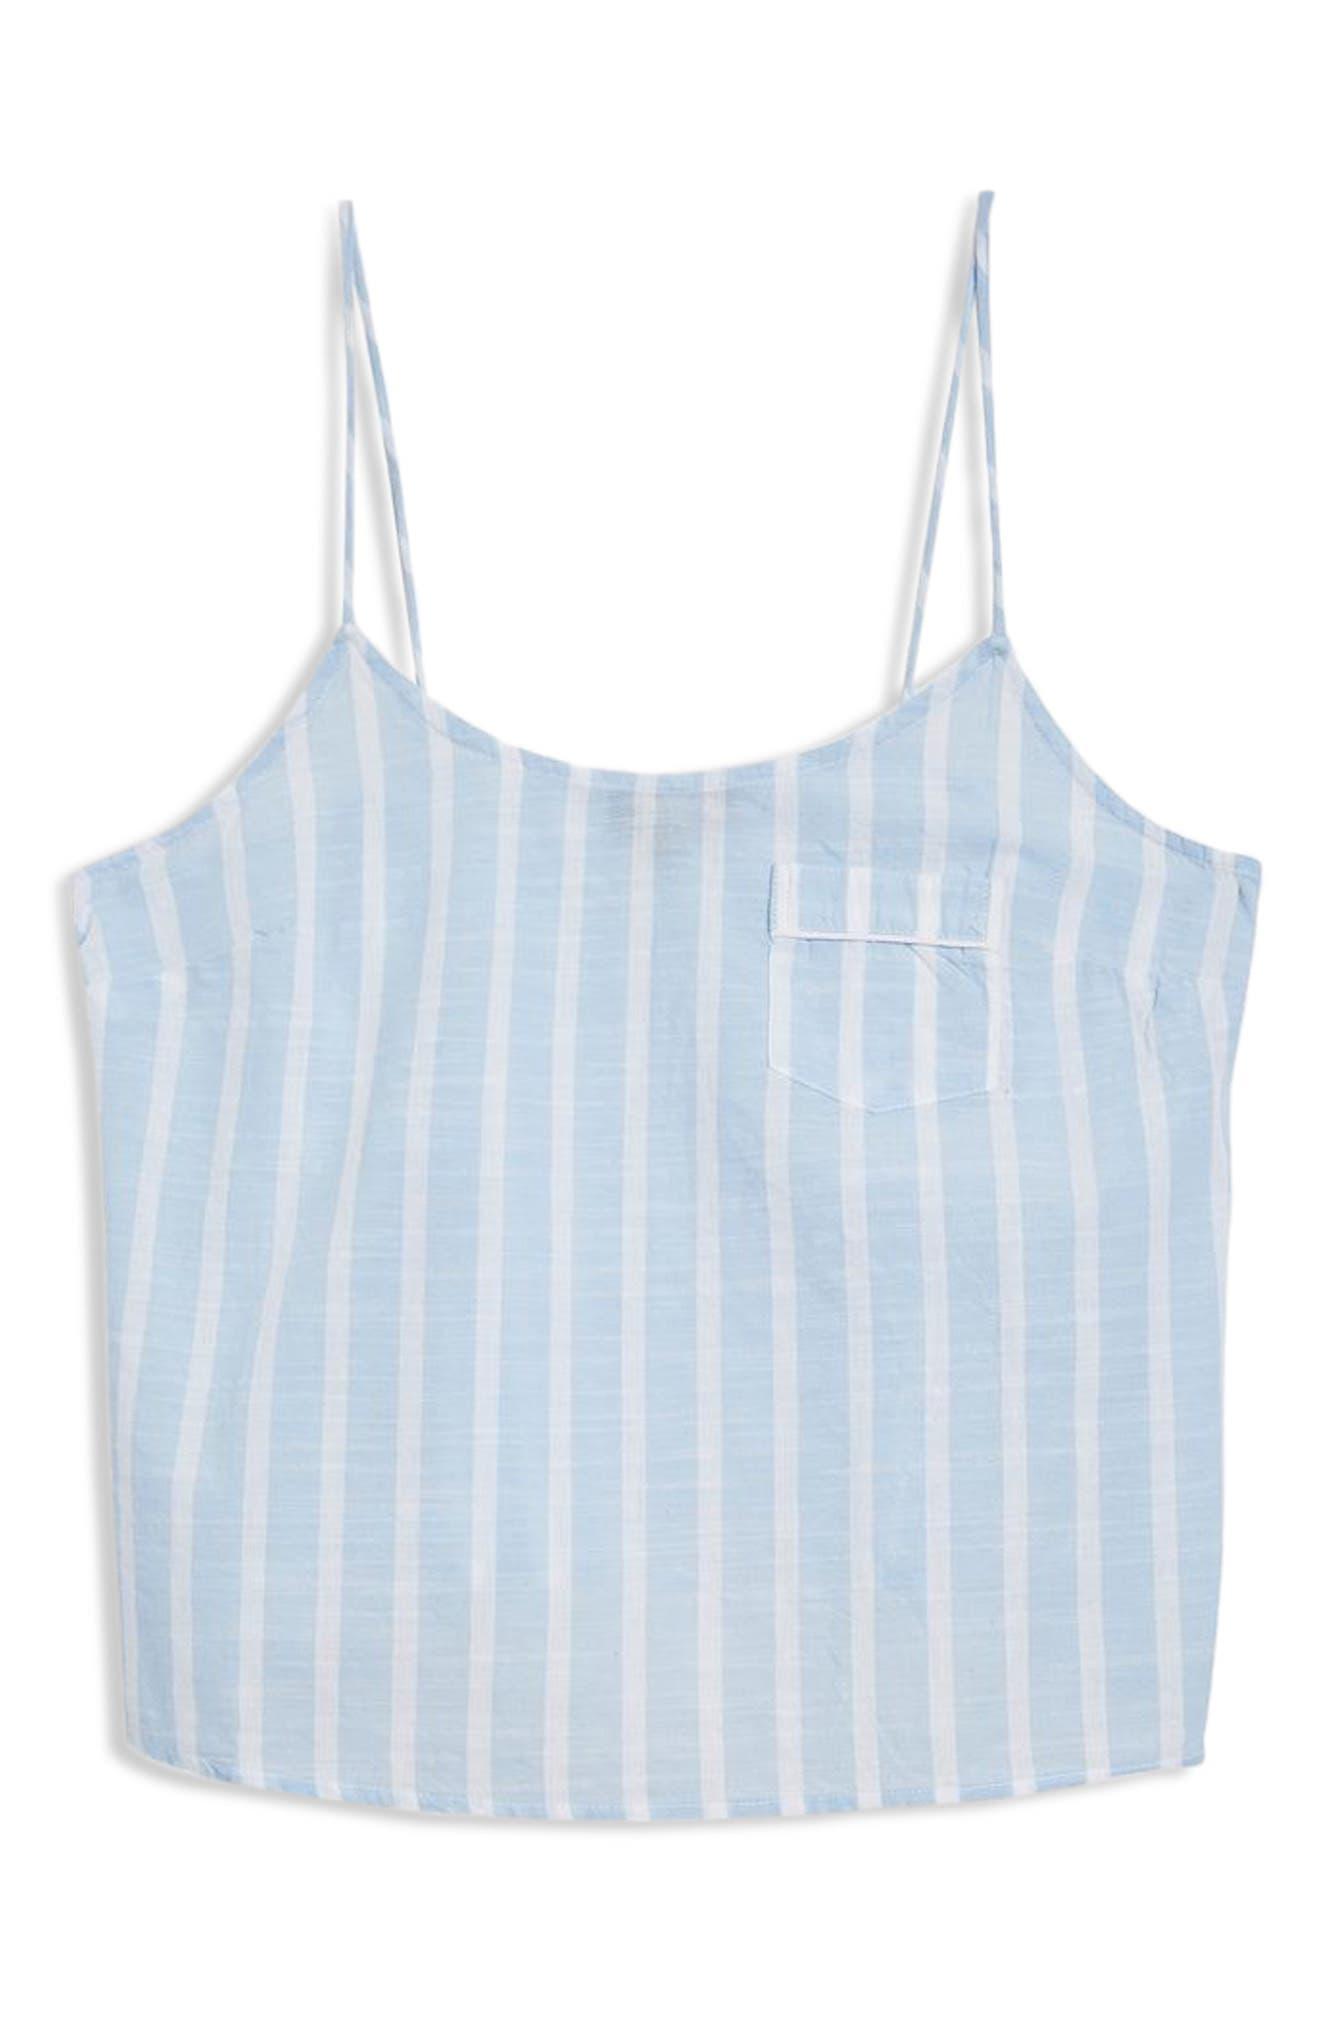 Stripe Camisole Pajama Top,                             Alternate thumbnail 3, color,                             LIGHT BLUE